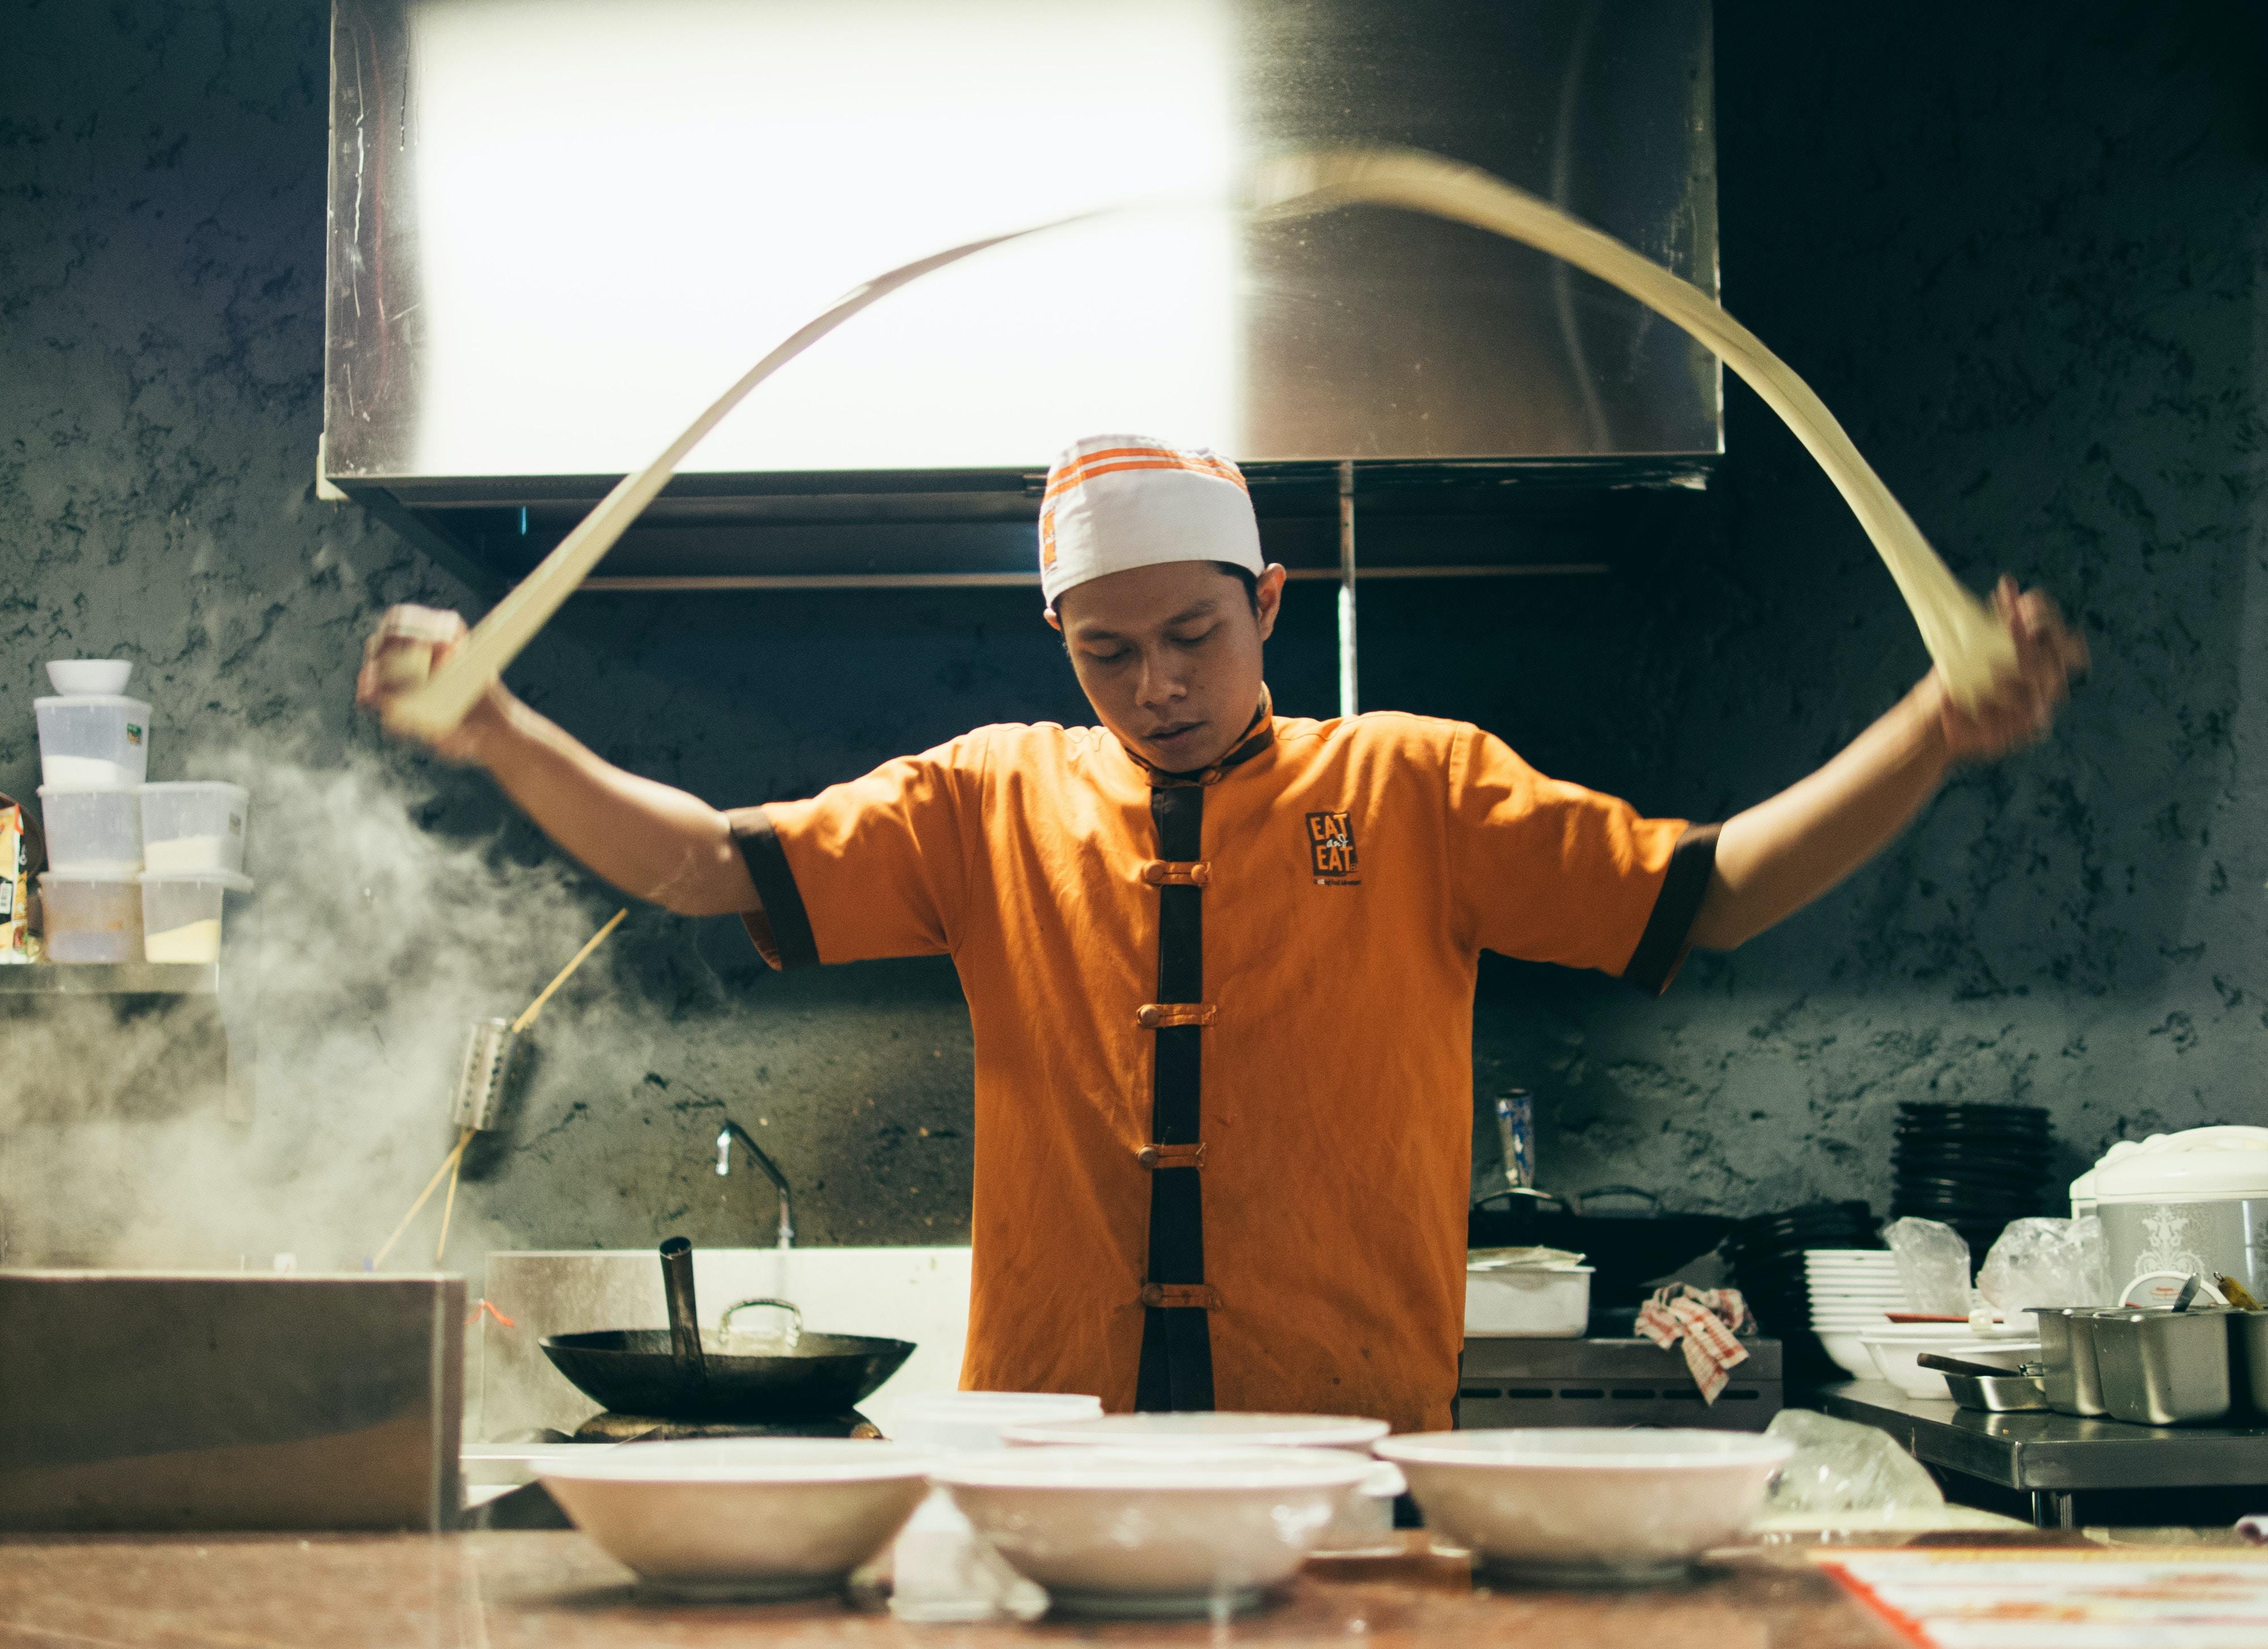 chef making pasta inside kitchen